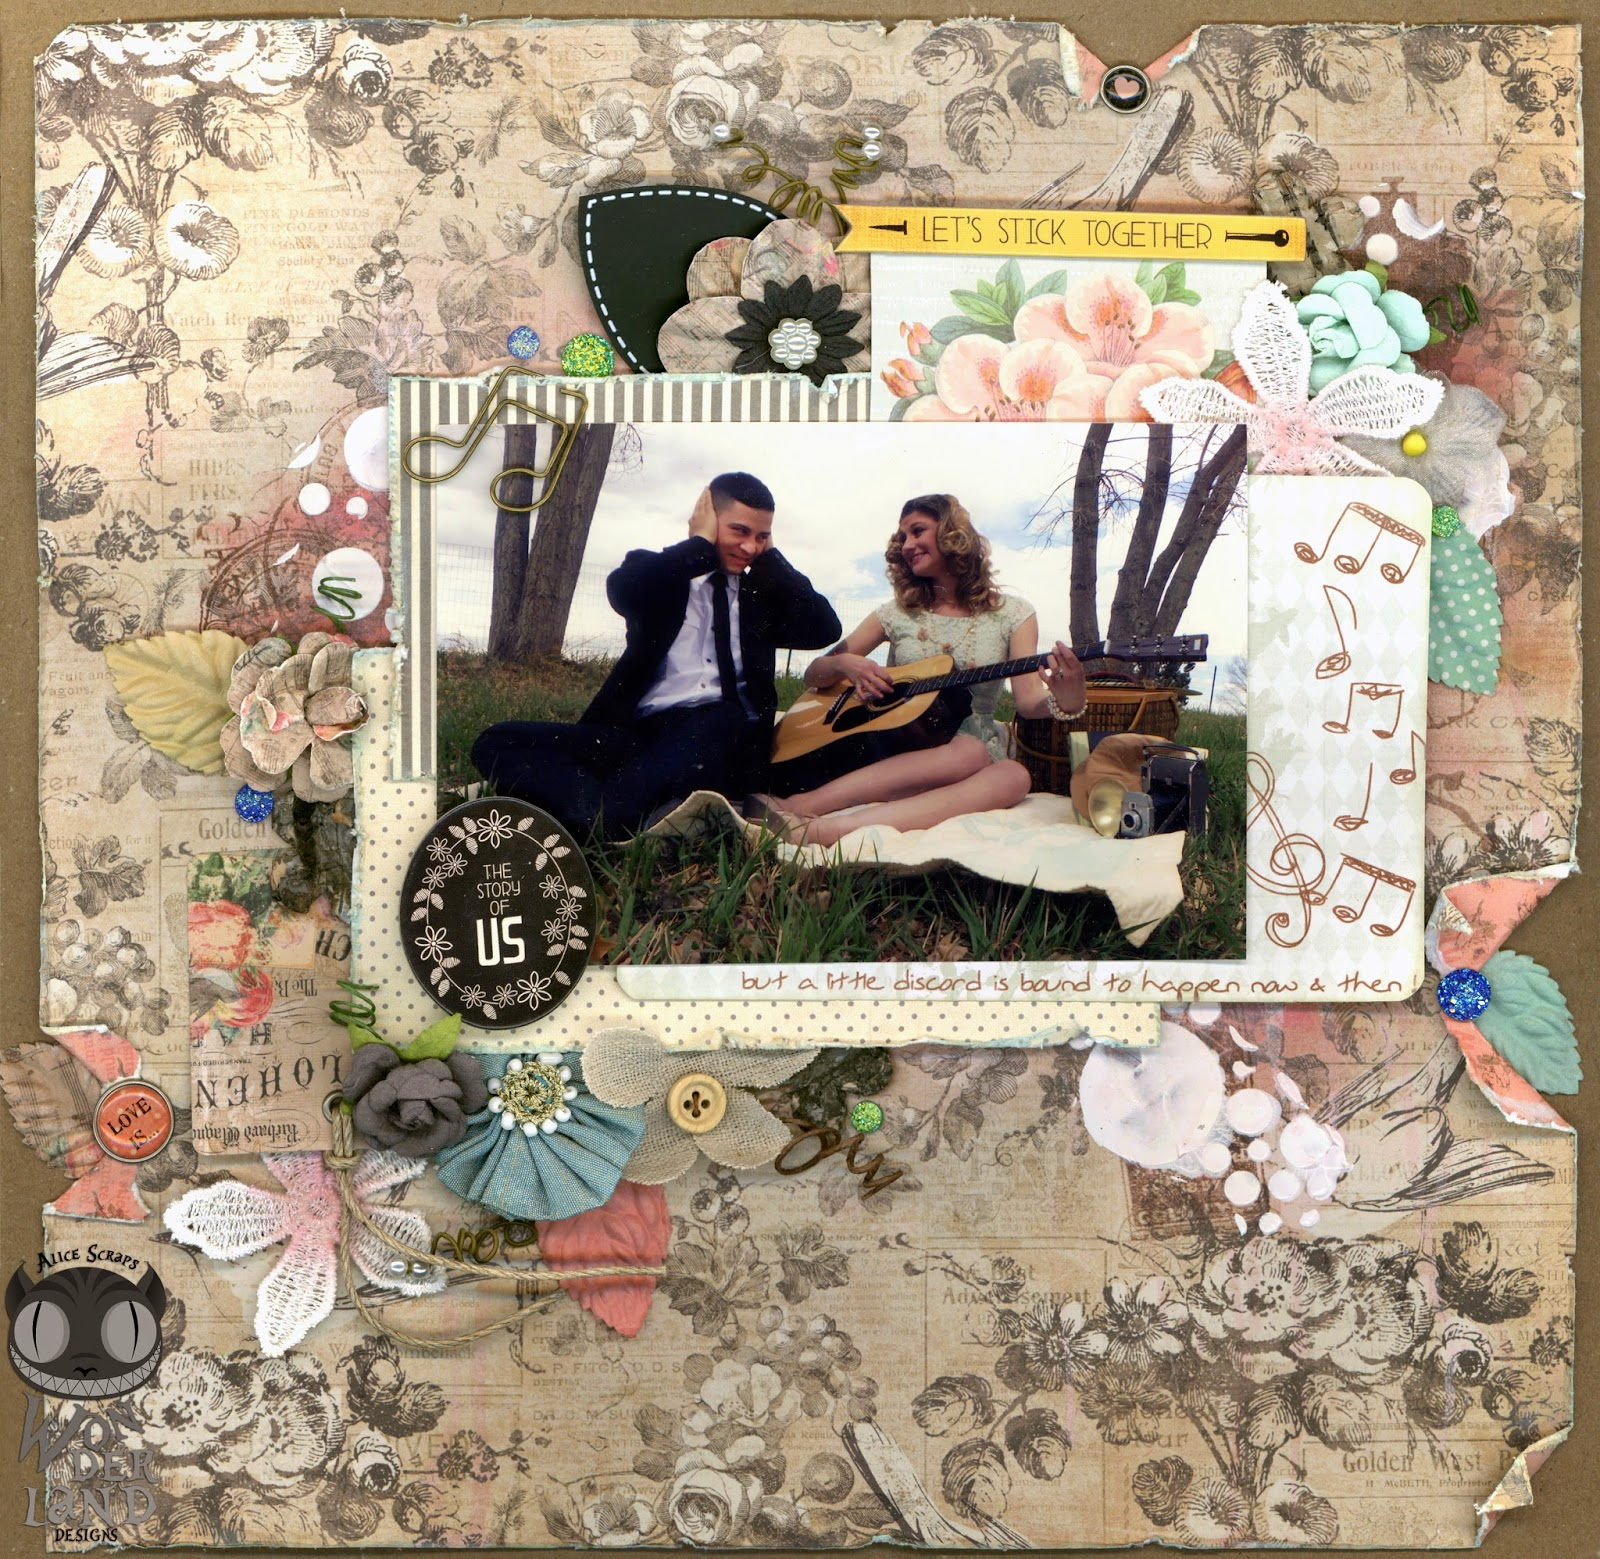 Lets Stick Together An Engagement Scrapbook Layout Alice Scraps